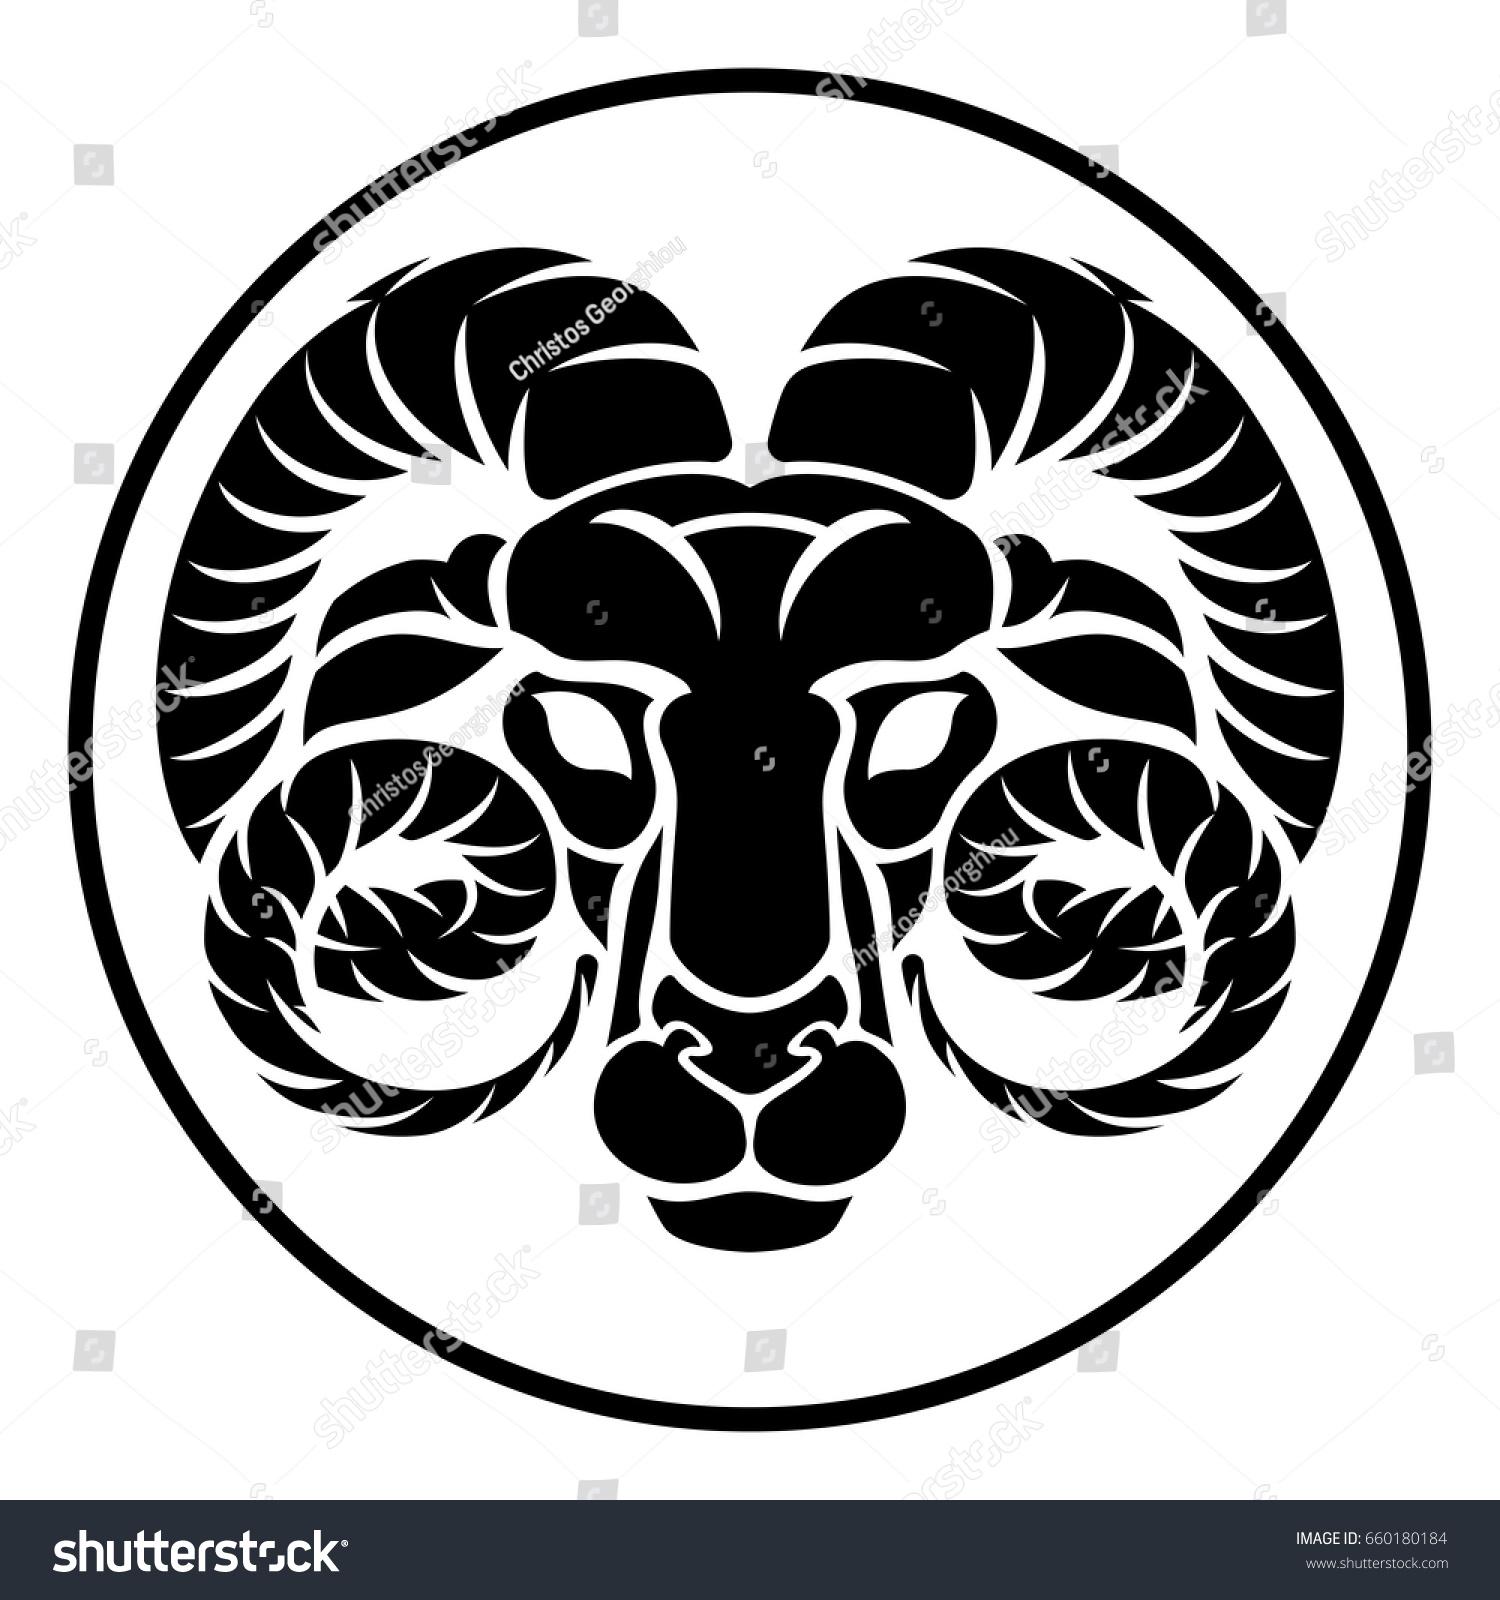 Circular Aries Ram Horoscope Astrology Zodiac Stock Vector Royalty